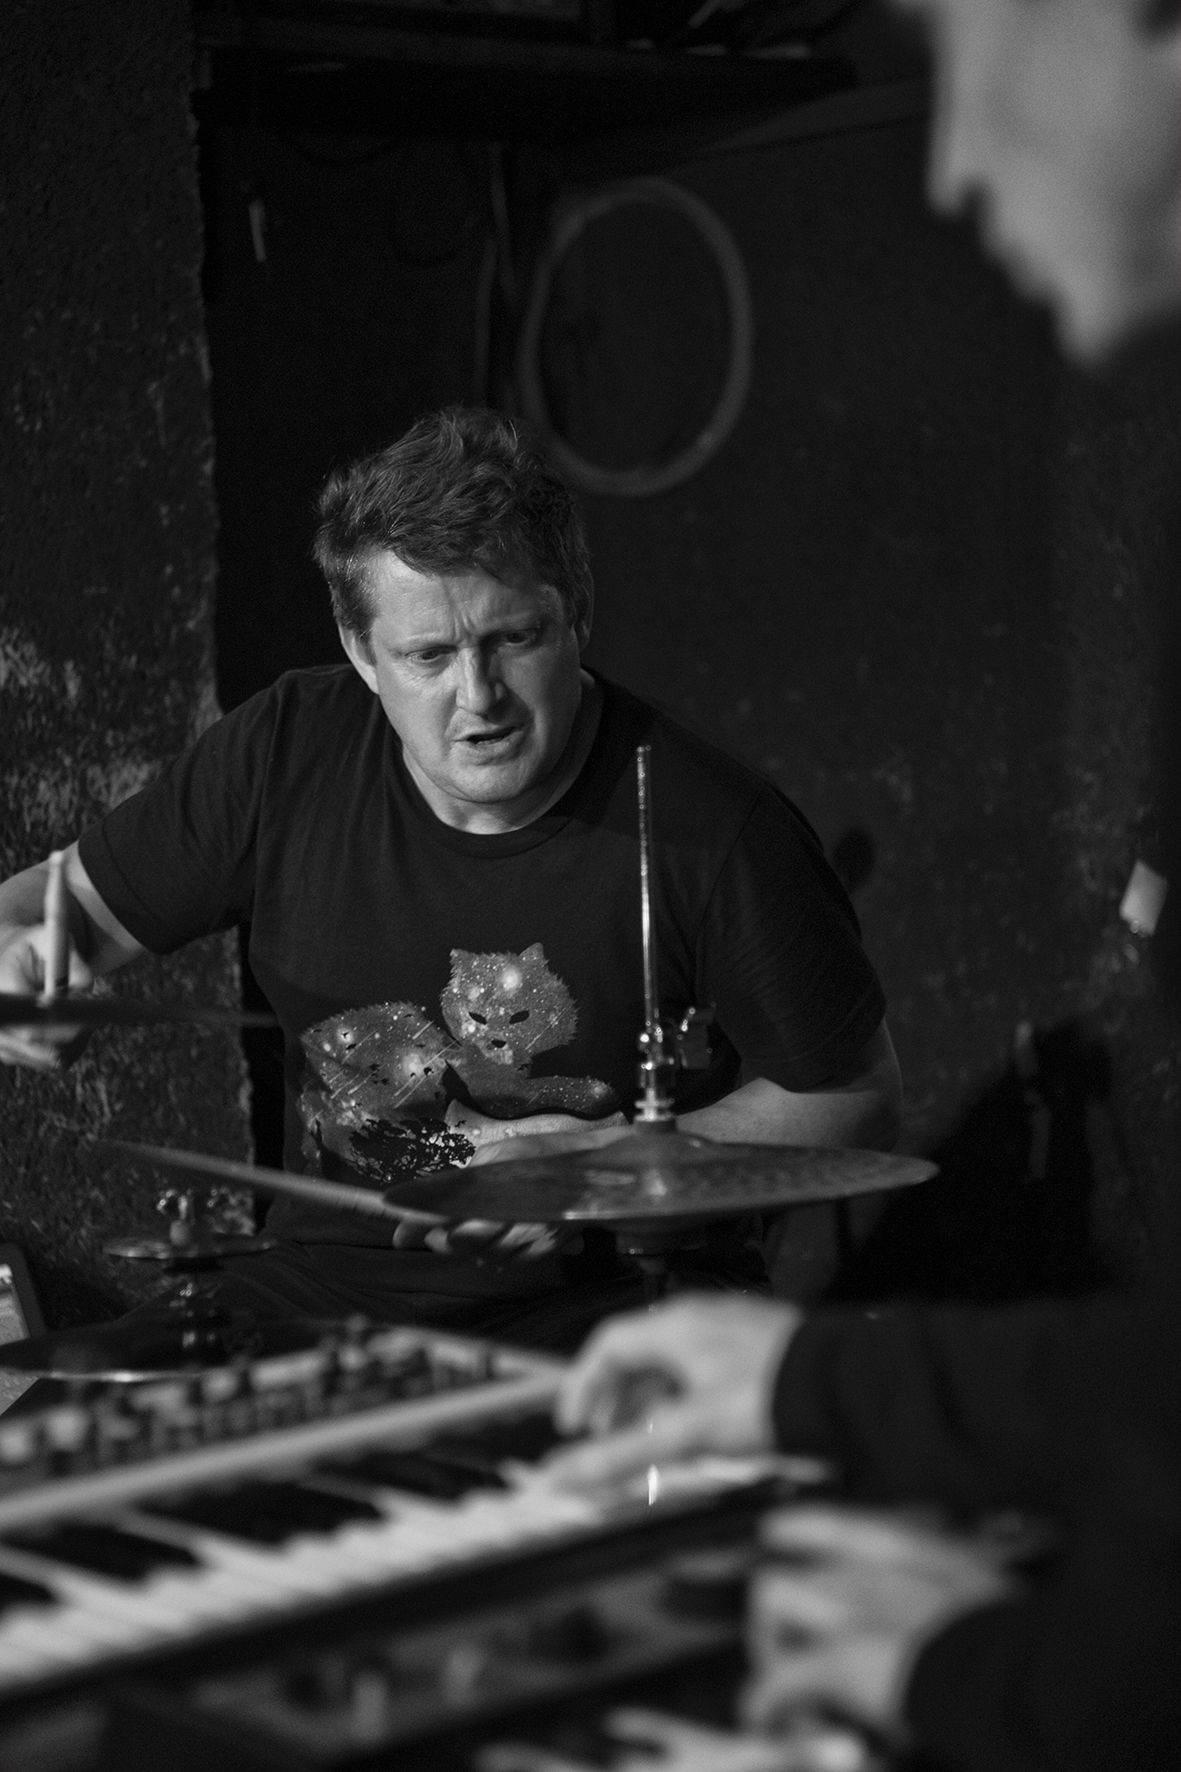 Crónica de Jim Black New Quartet. Xancarajazz, Vigo. 13 de mayo de 2015. VIII Ciclo 1906